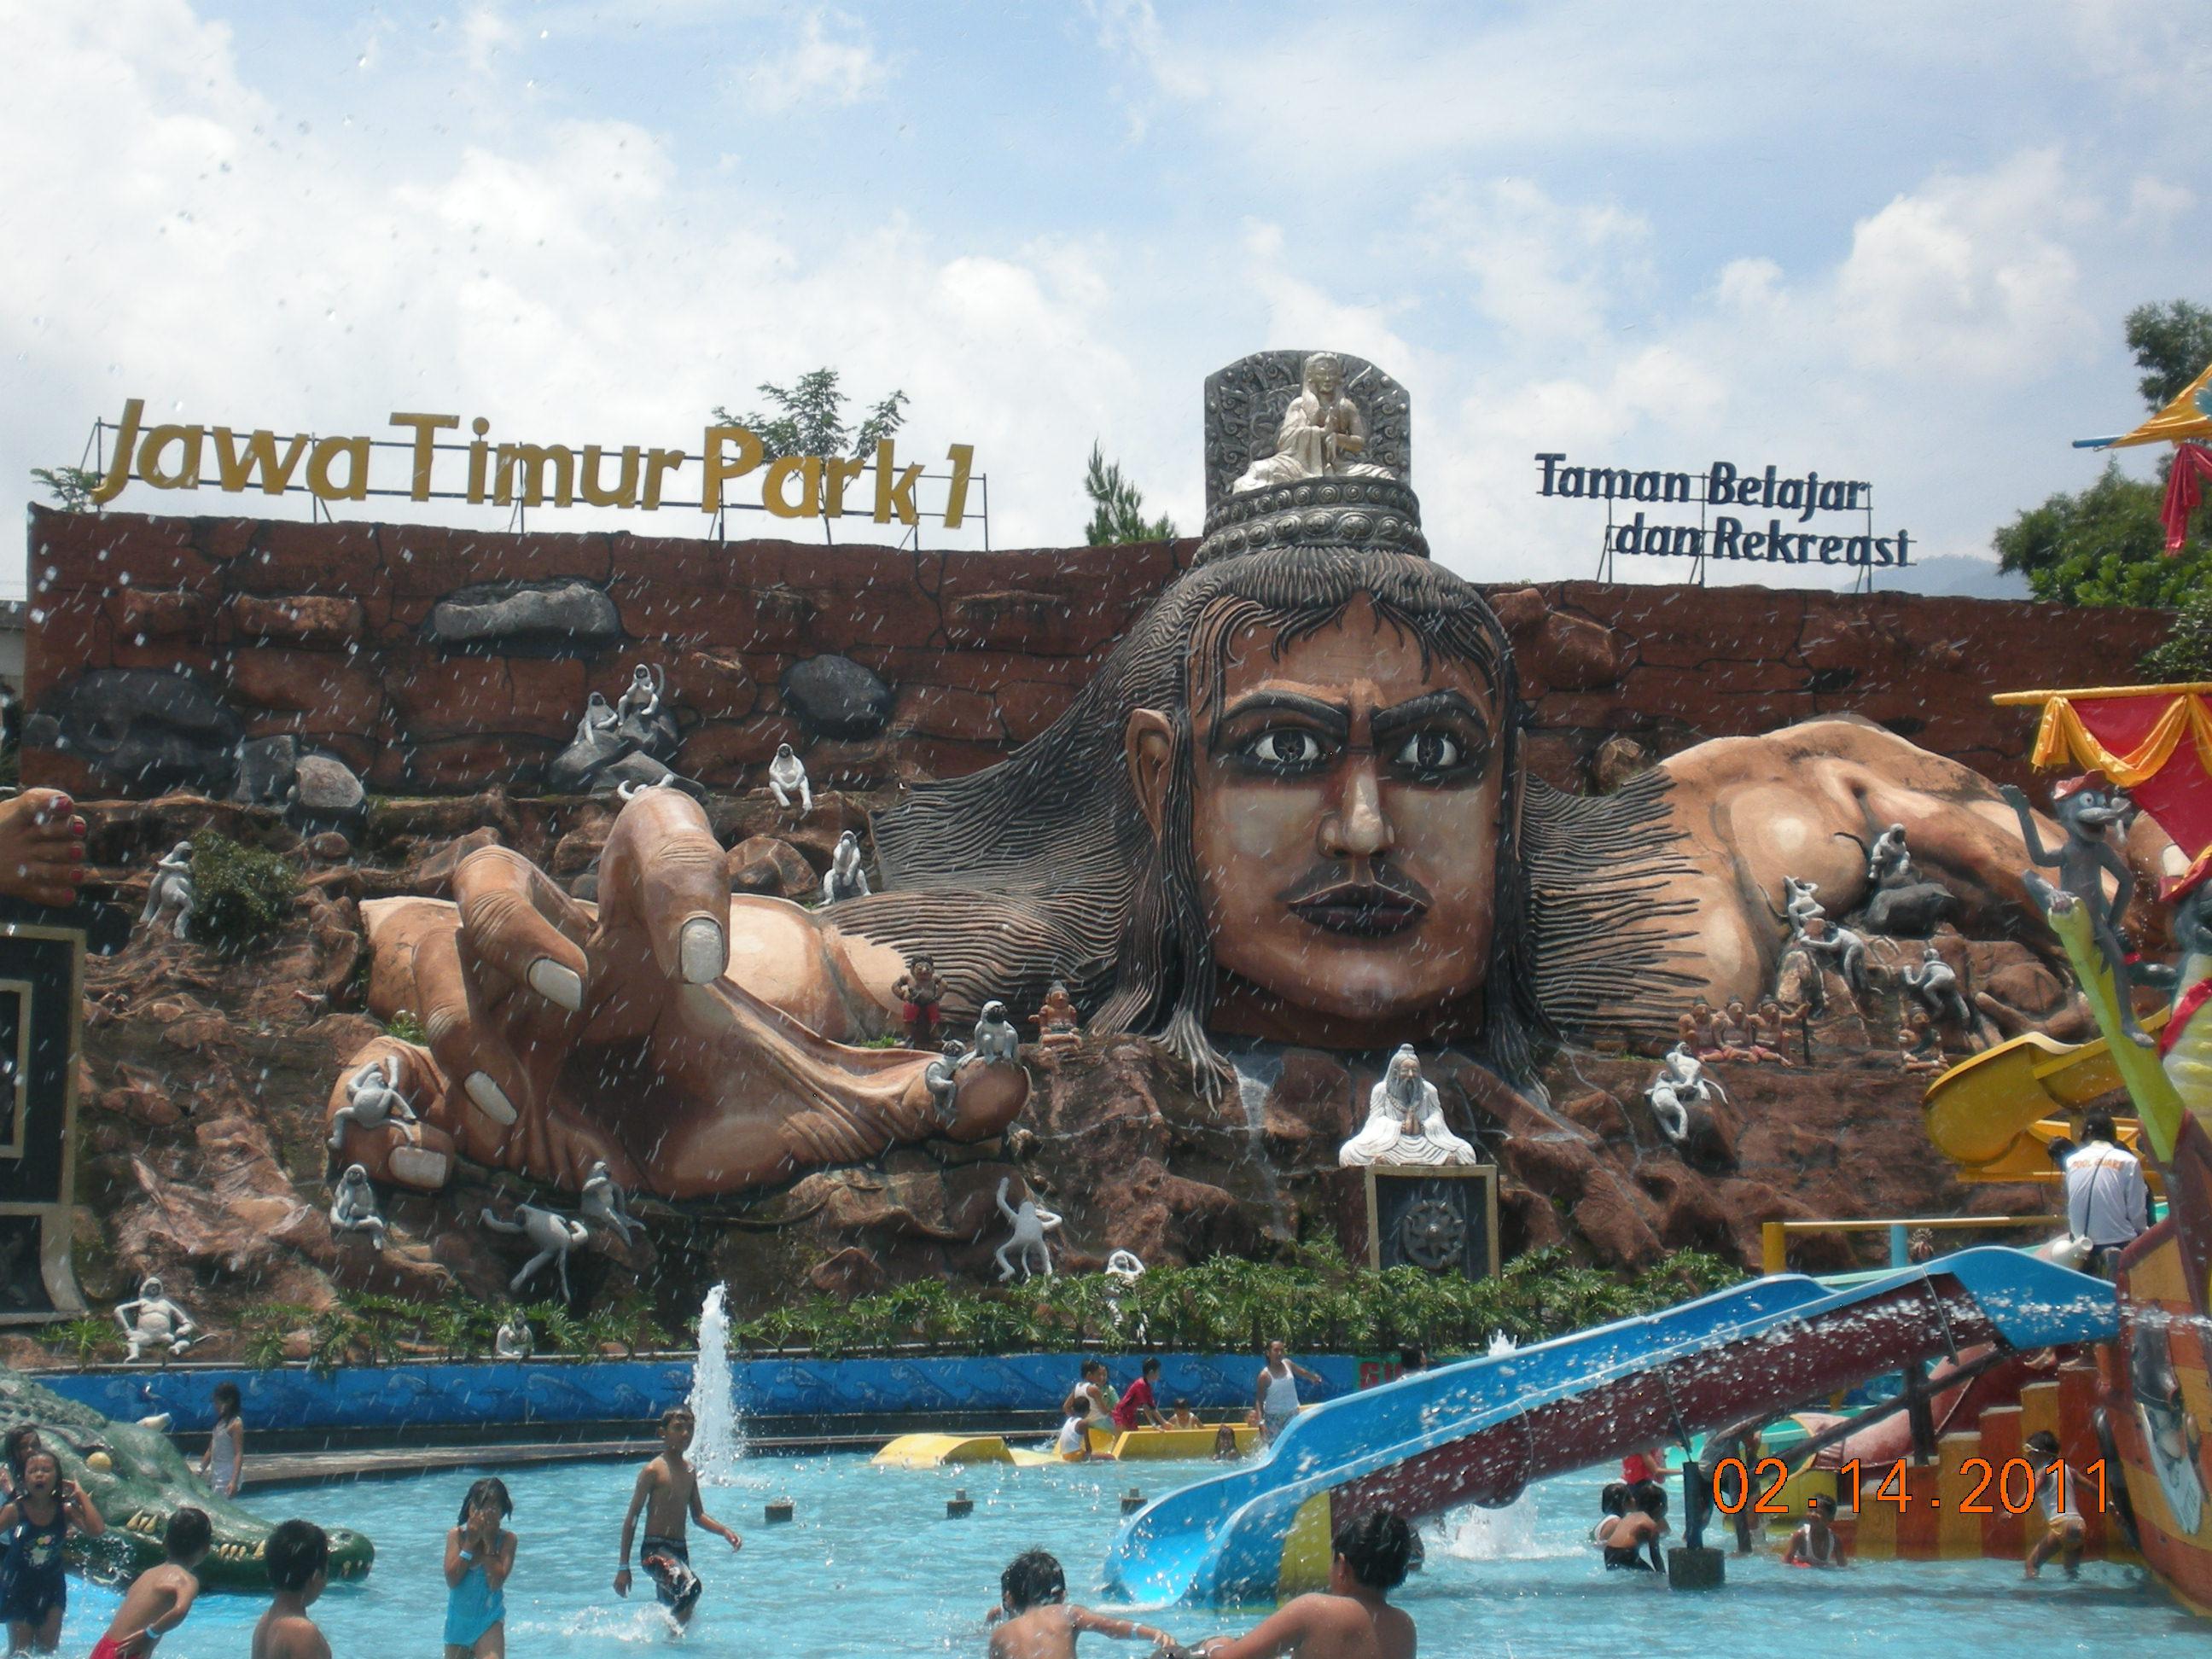 Infromasi Lengkap Wisata Jatim Park 1 Batu Terkini Jawa Timur